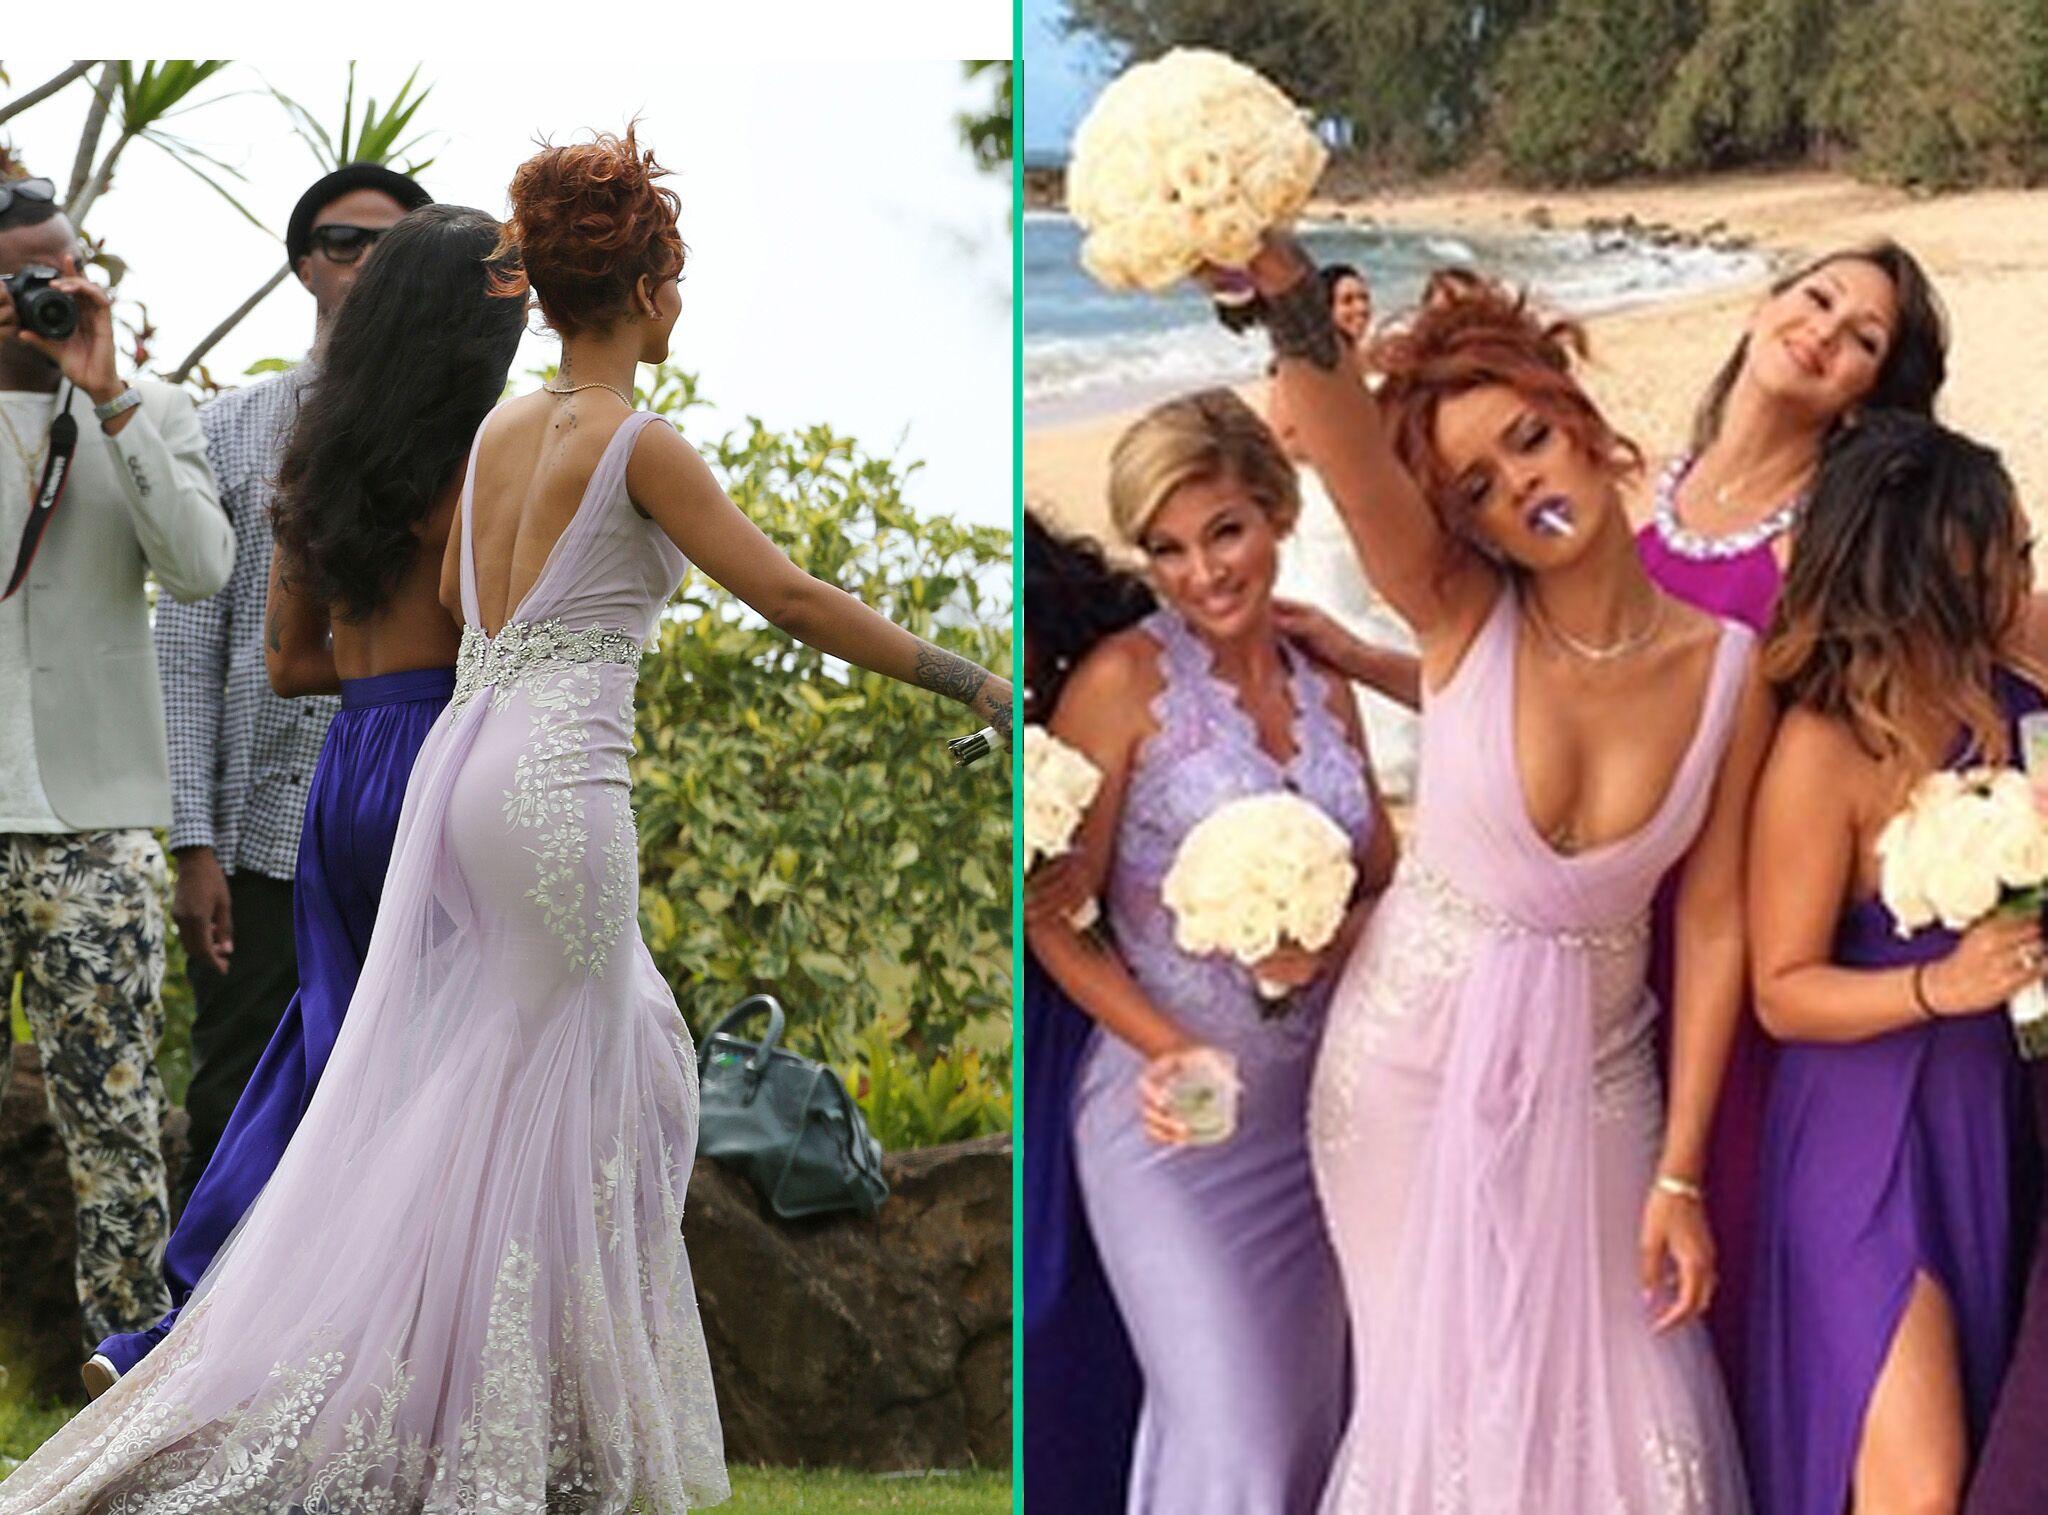 Demoiselle D'honneur Rihanna Ultra Classeou PresquePour Photos 9HIYDE2W